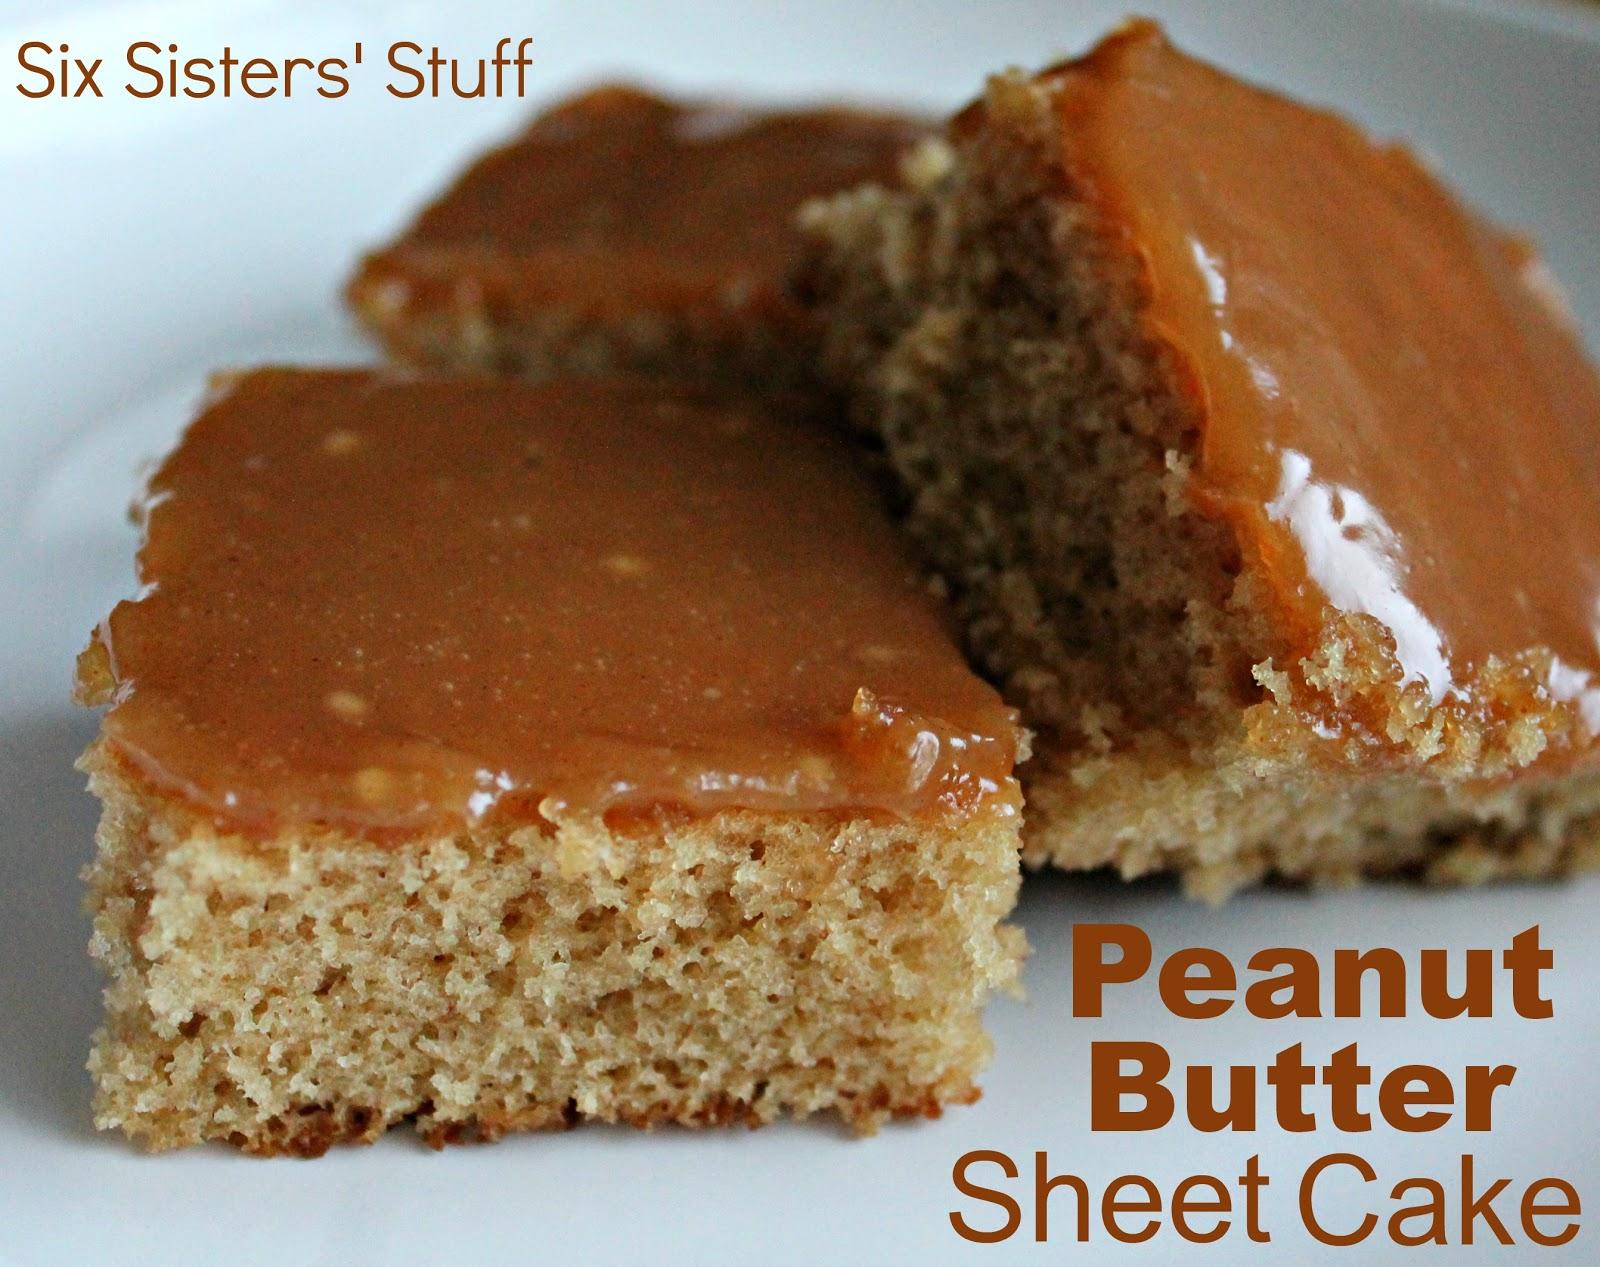 Peanut Butter Sheet Cake | Six Sisters' Stuff